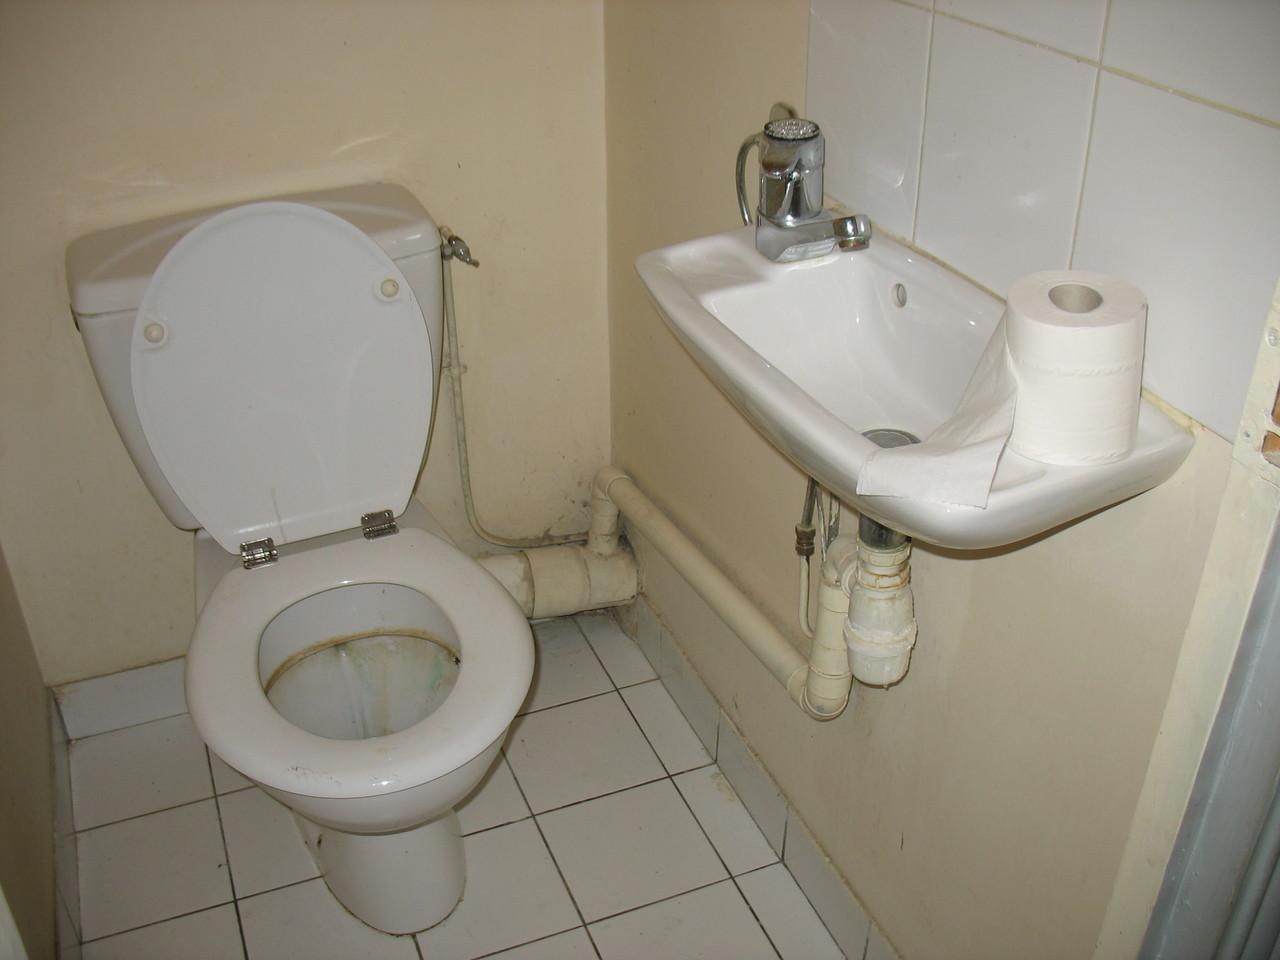 Before renovation: toilet